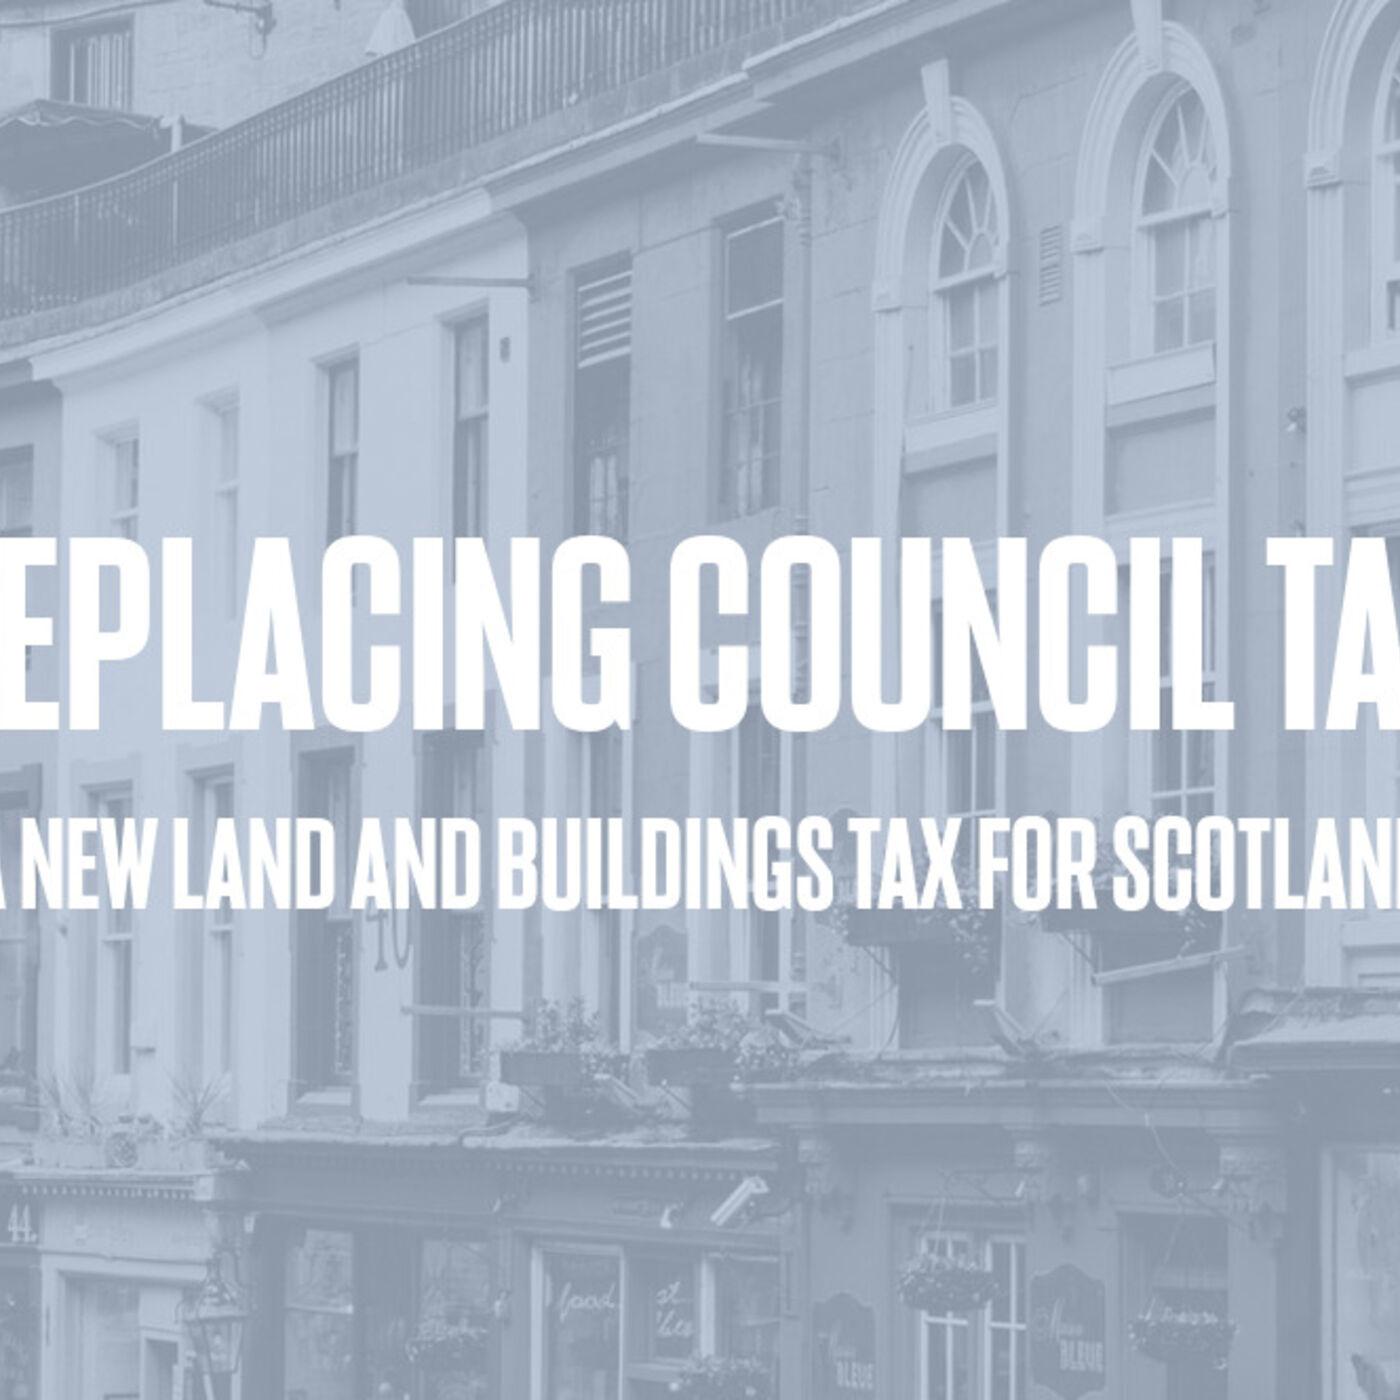 Episode #76 - Replacing Council Tax